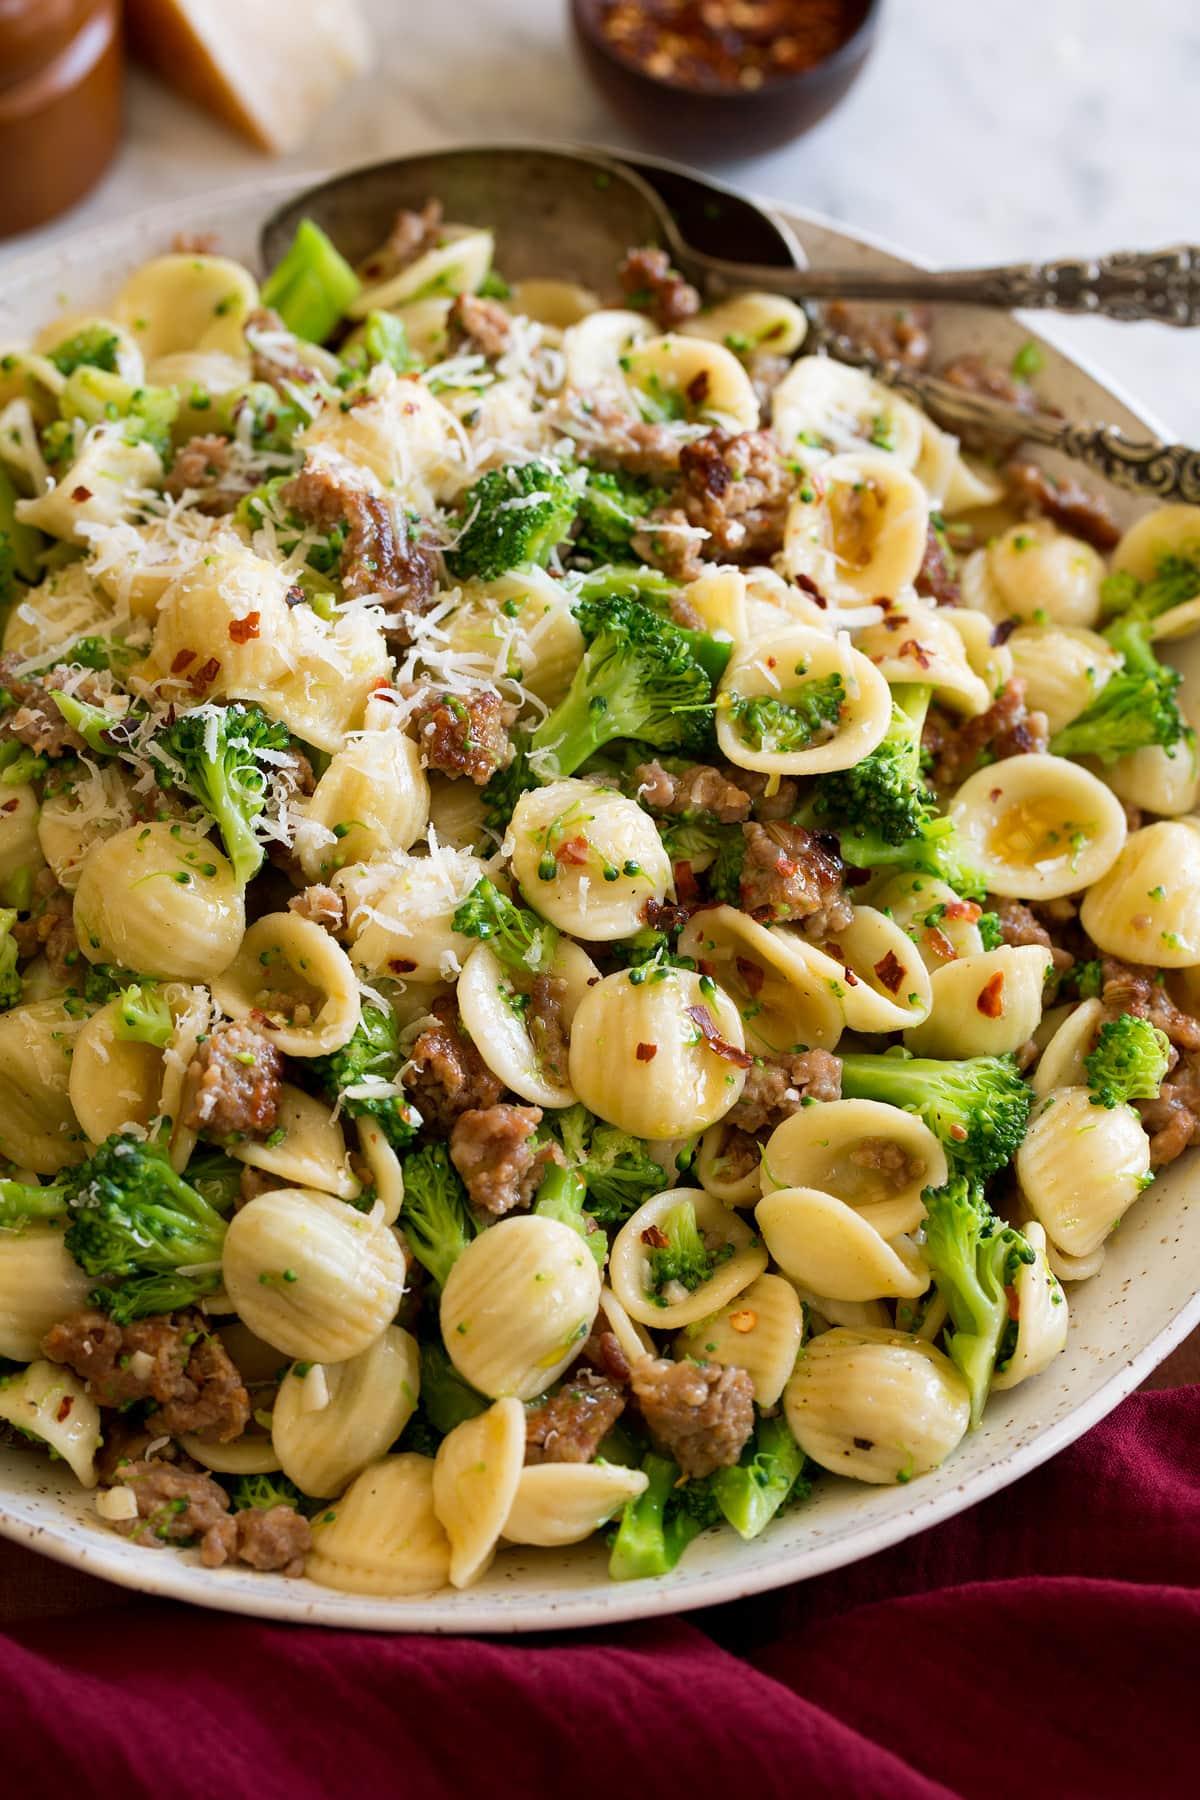 Photo: Orecchiette pasta with broccoli, Italian sausage and parmesan in a s olive oil sauce.